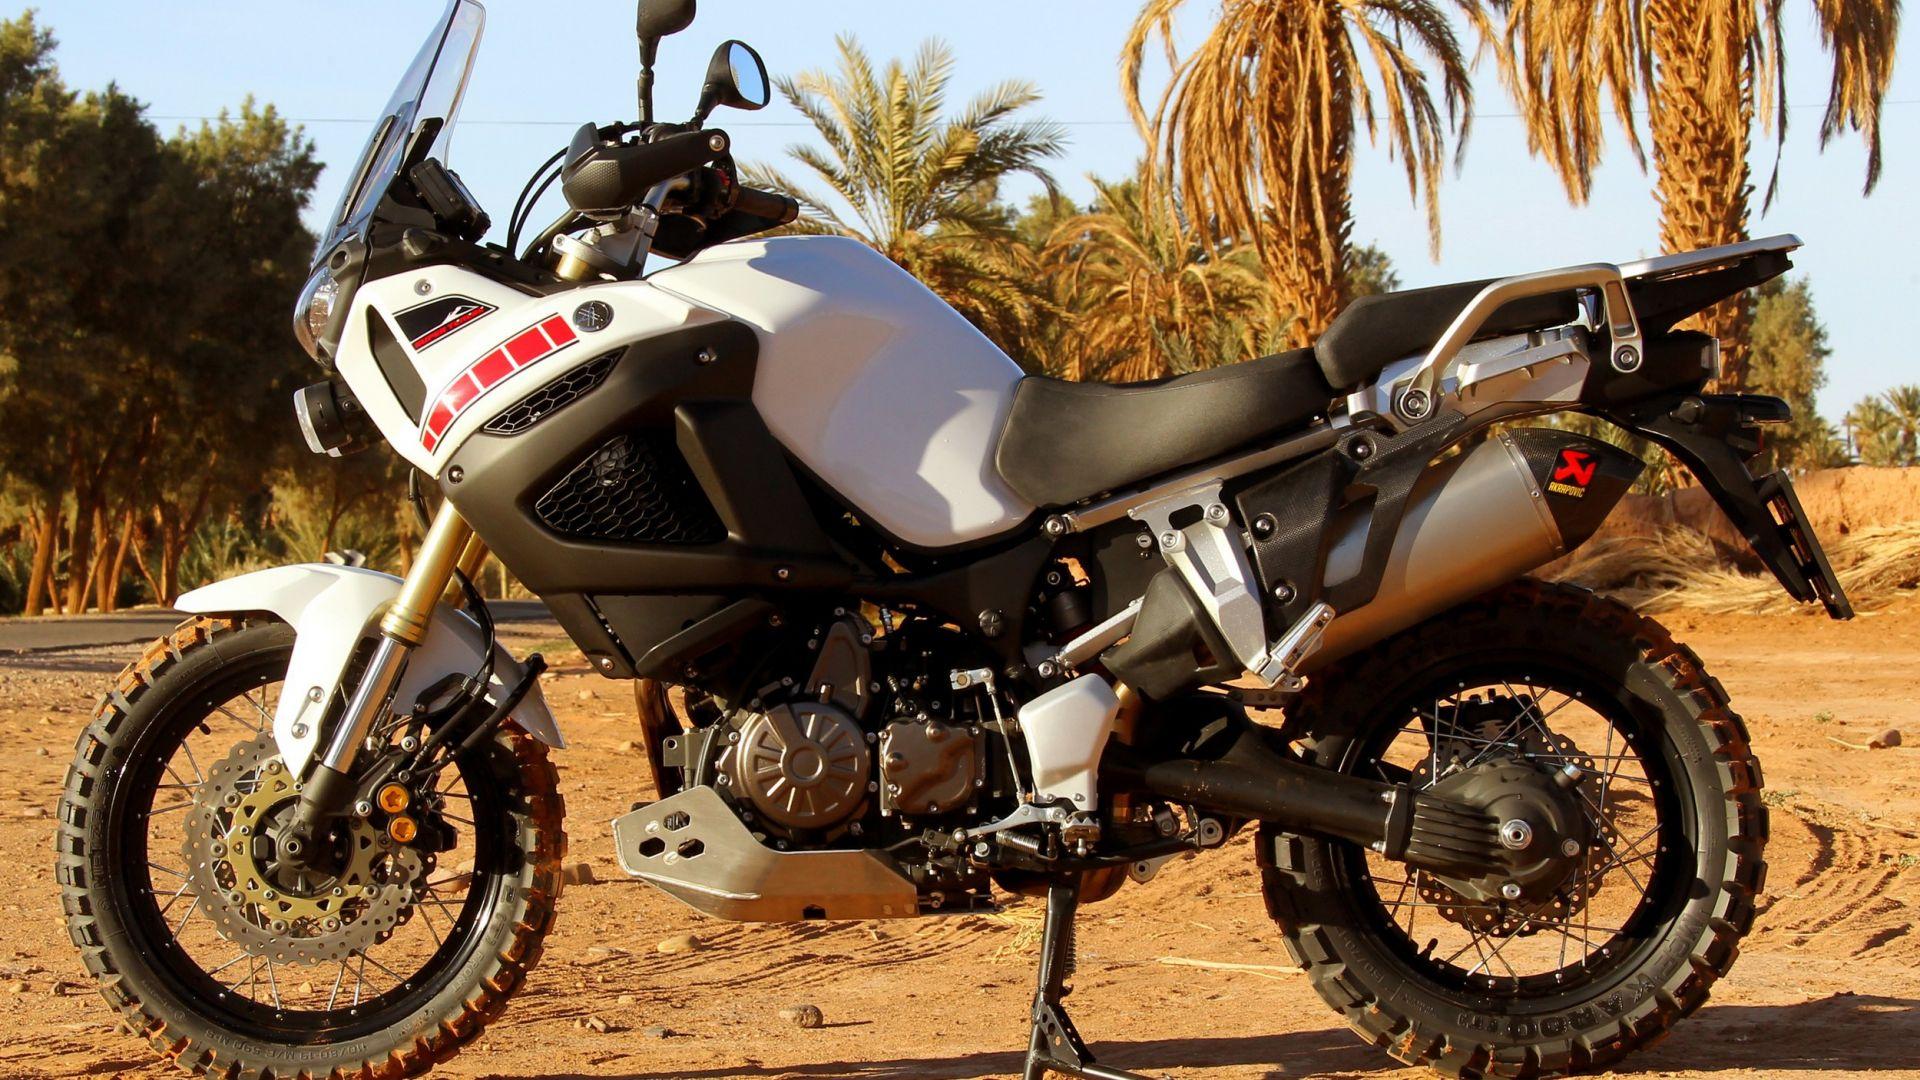 Immagine 38: In Marocco con la Yamaha Super Ténéré